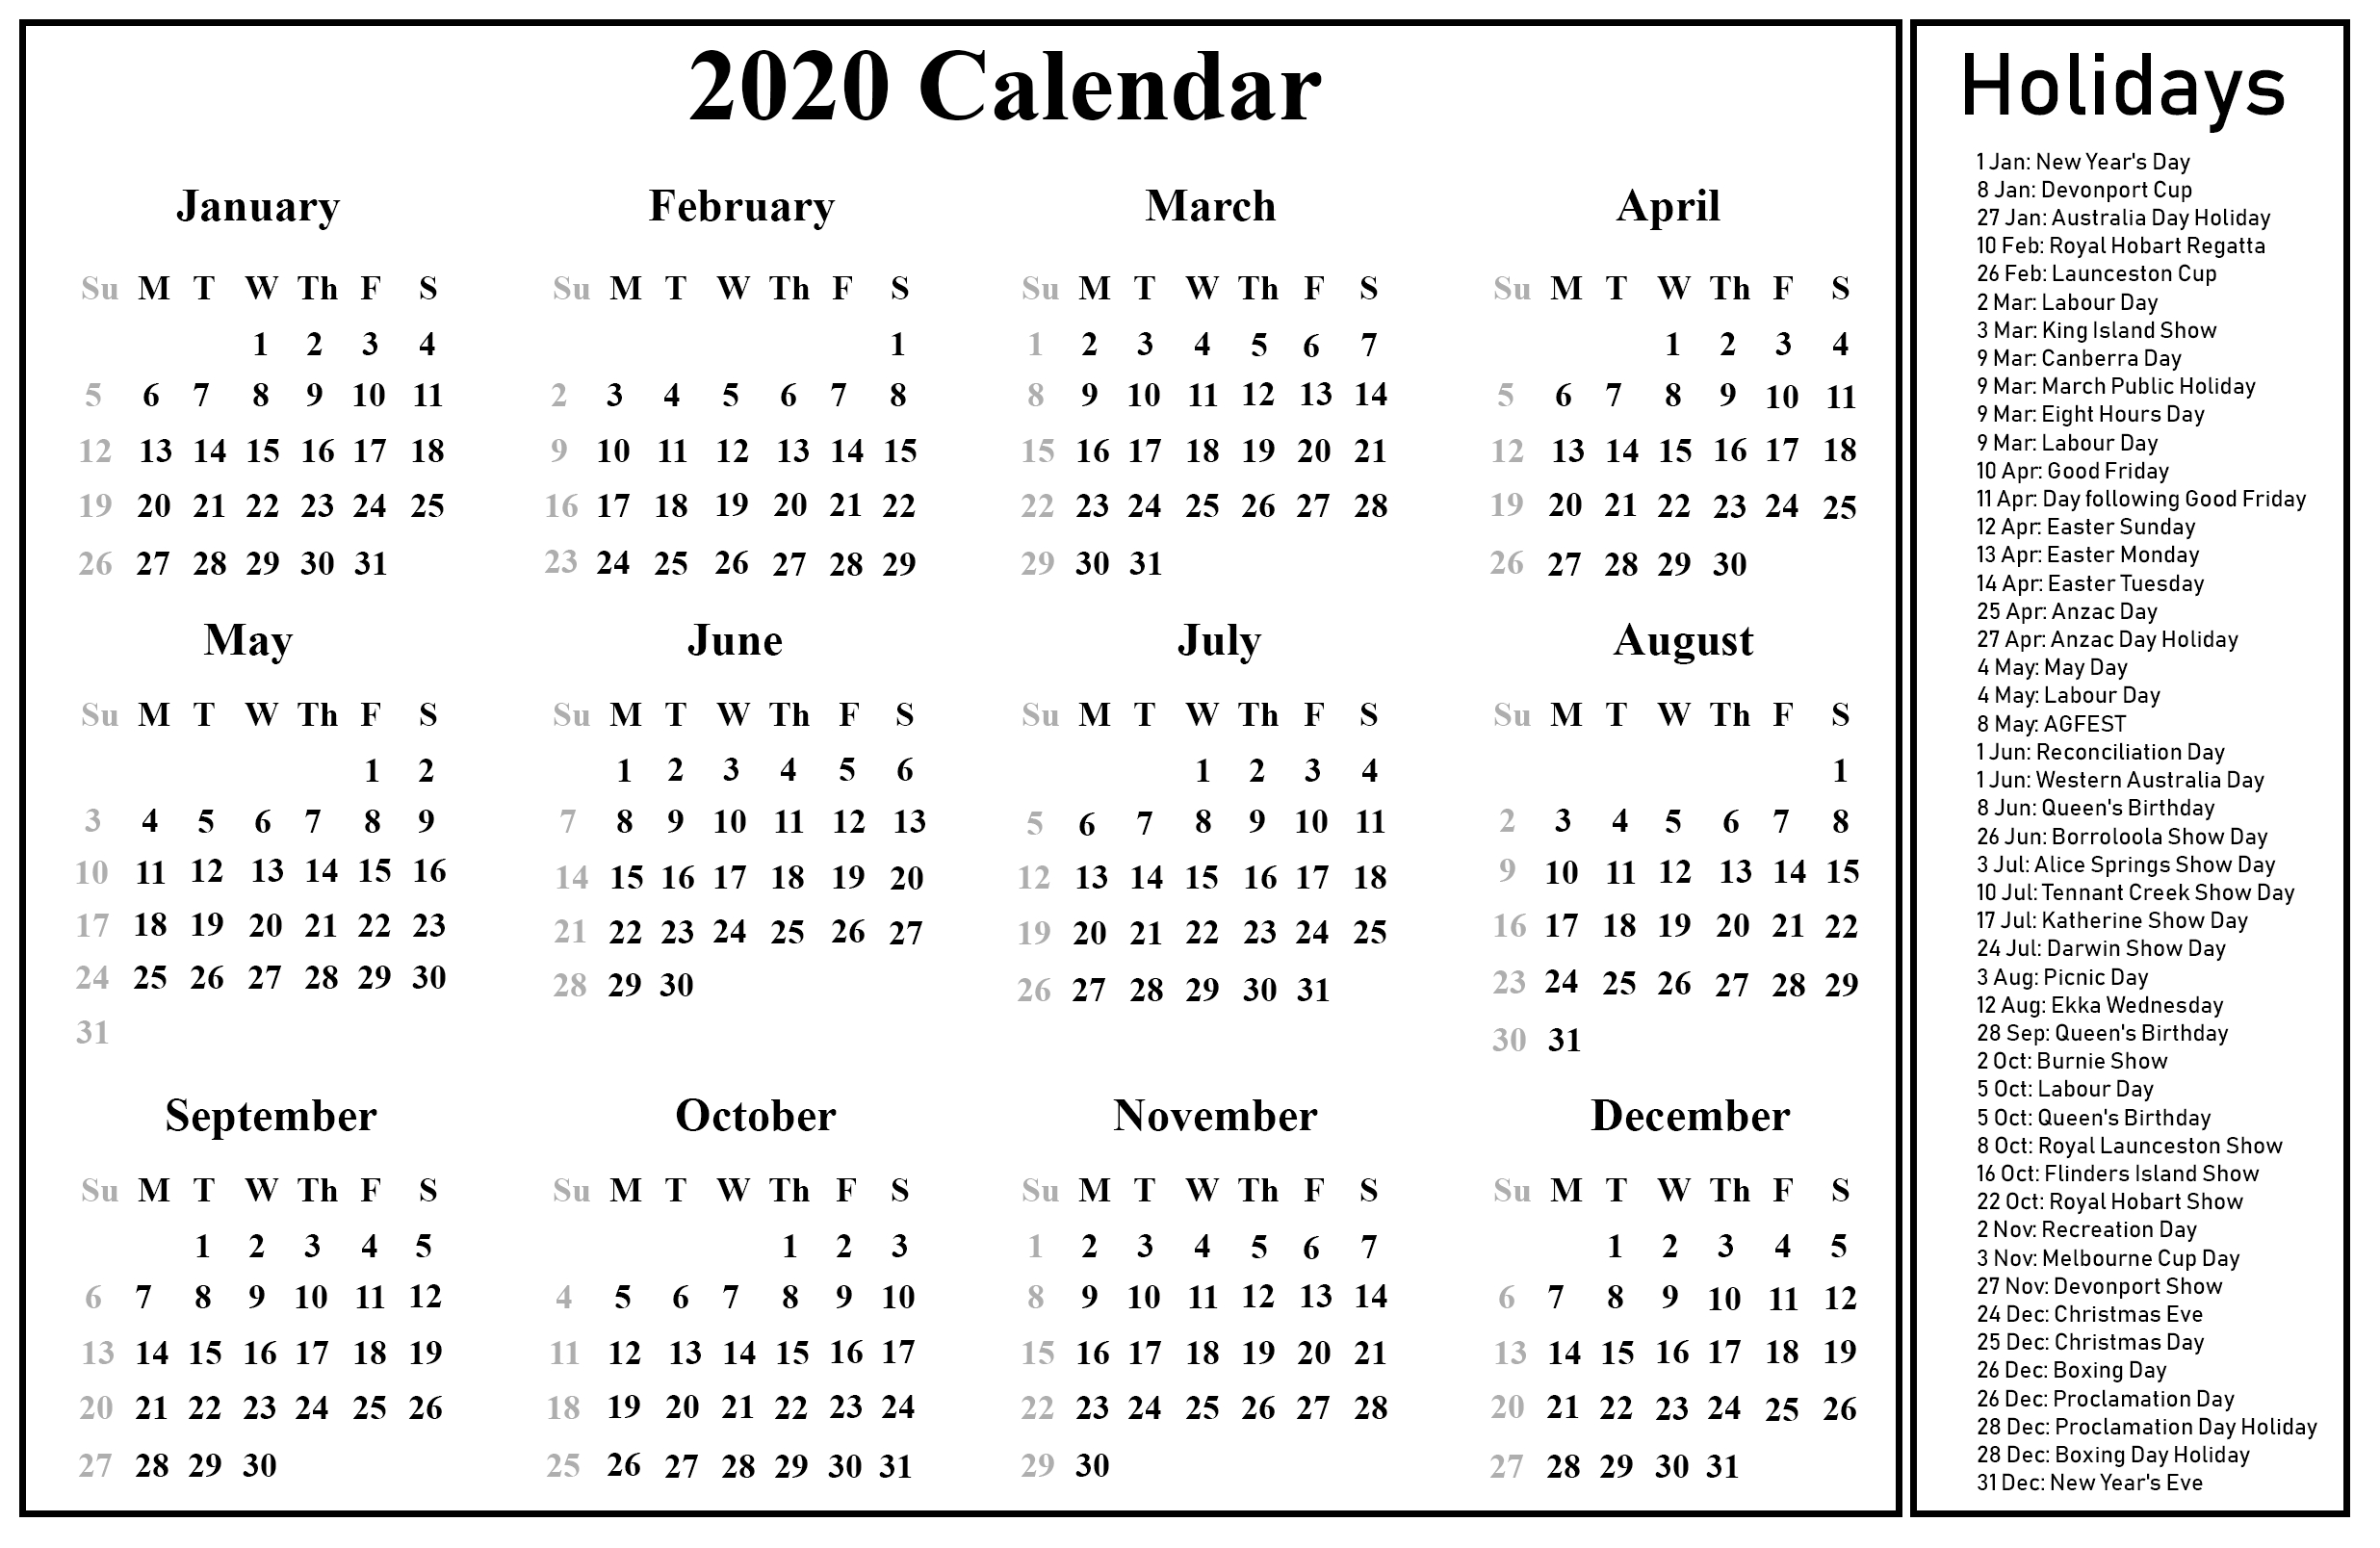 Free Blank Australia Calendar 2020 In Pdf, Excel & Word